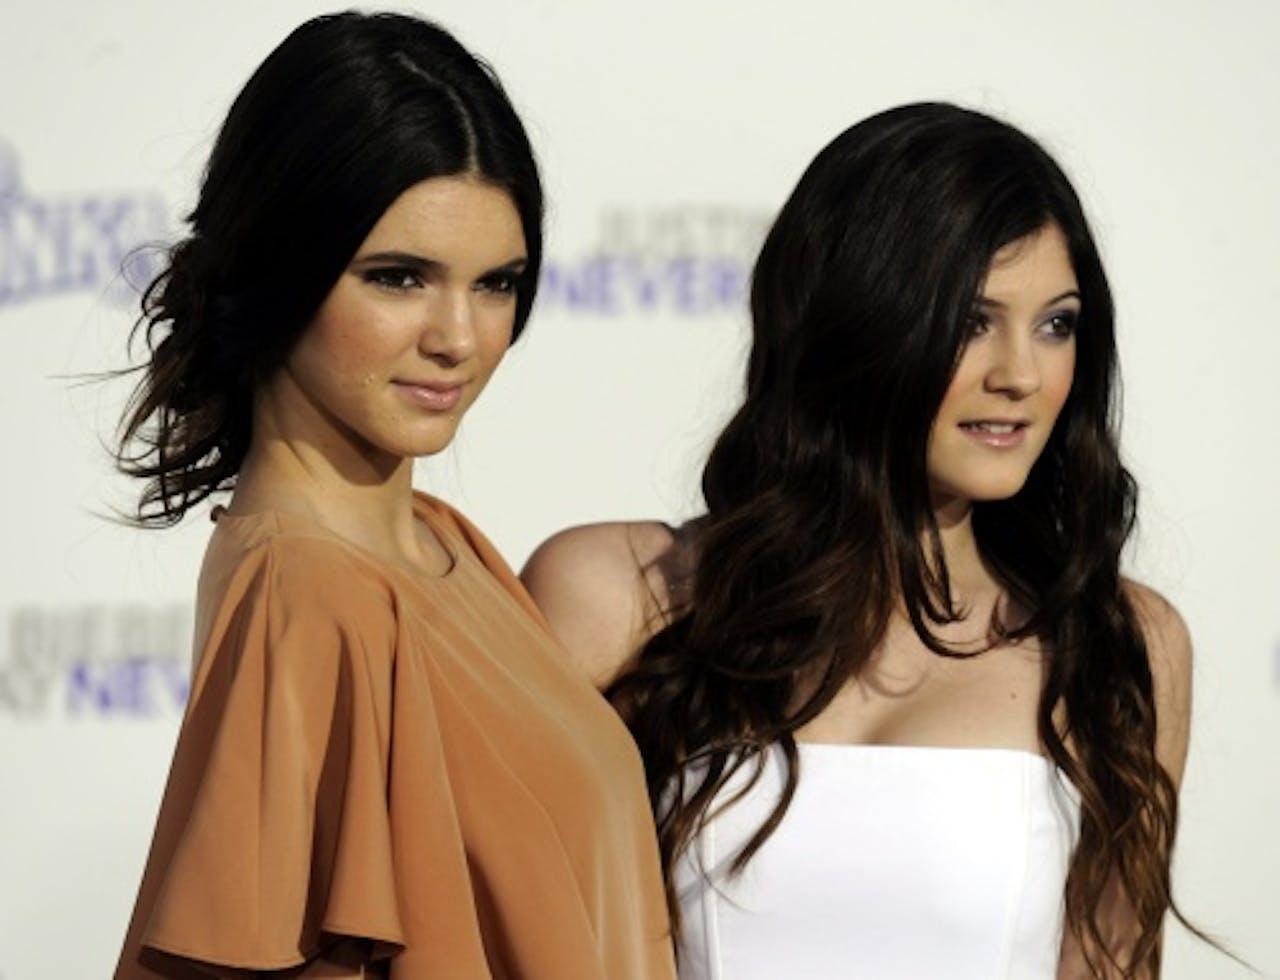 Kylie Jenner (R). EPA